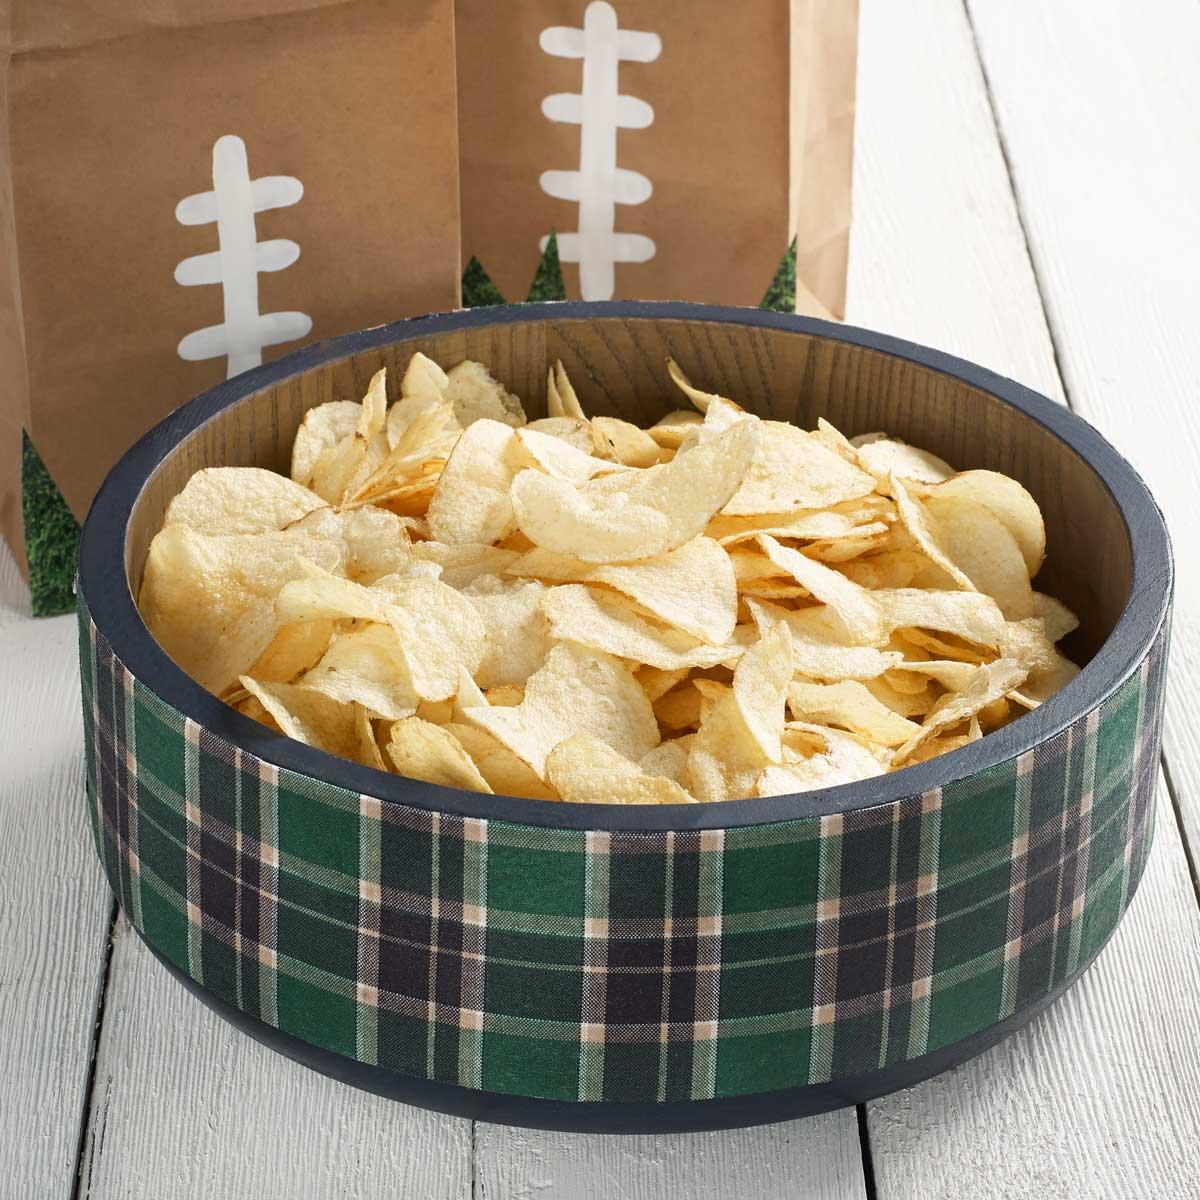 DIY Tailgate Idea - Plaid Chip Bowl